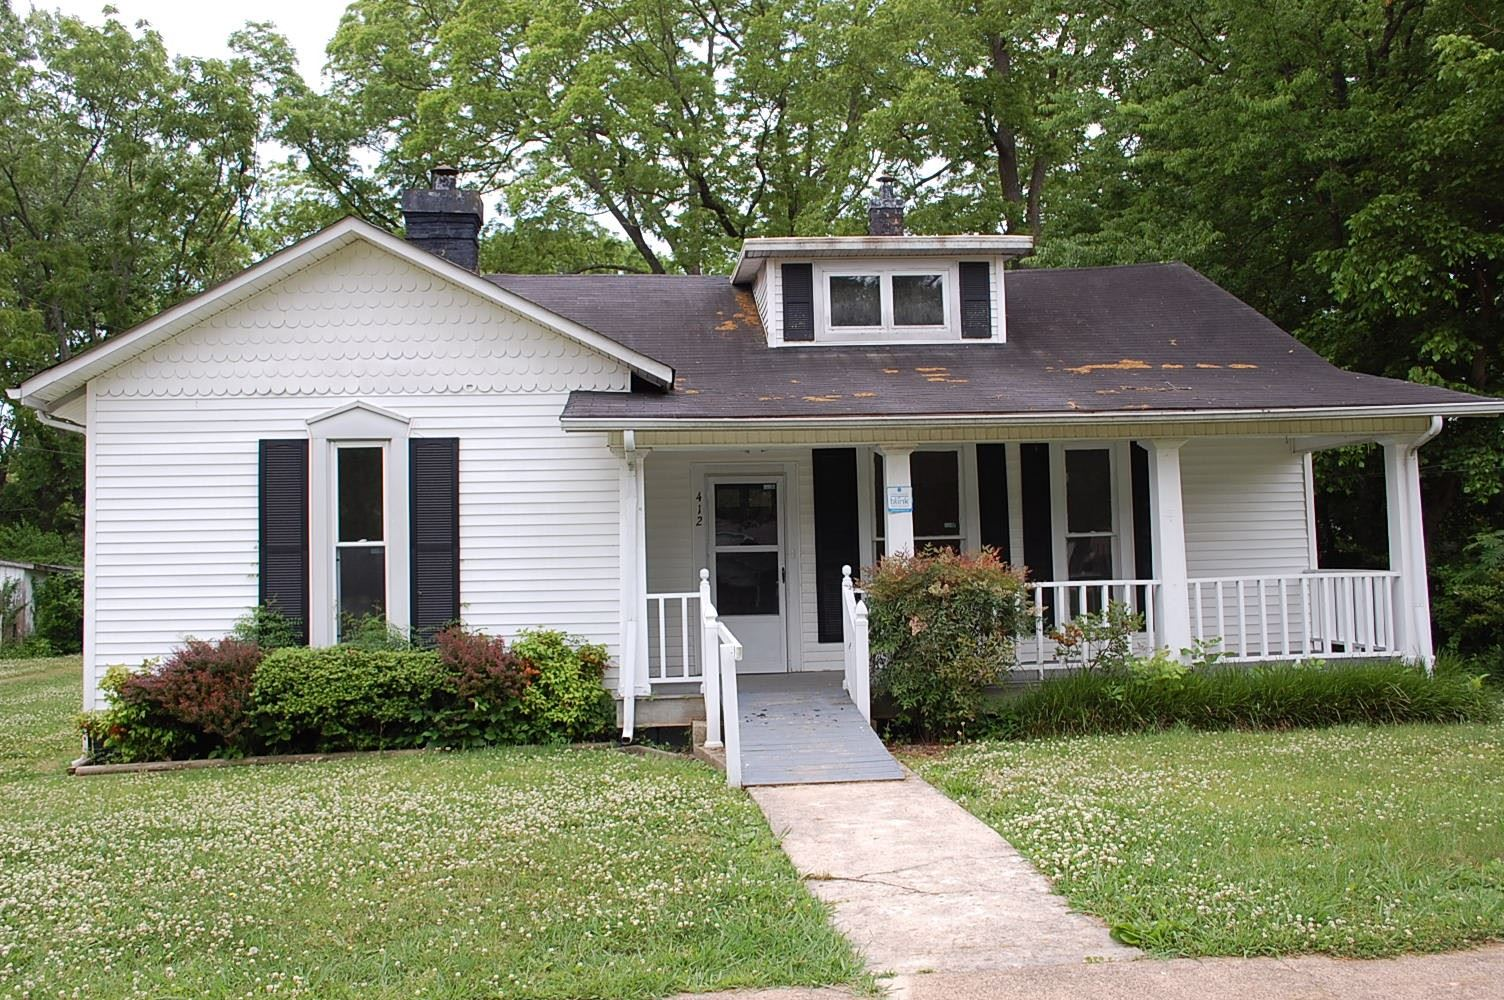 412 E Grundy St, Tullahoma, TN 37388 - MLS#: 2258723